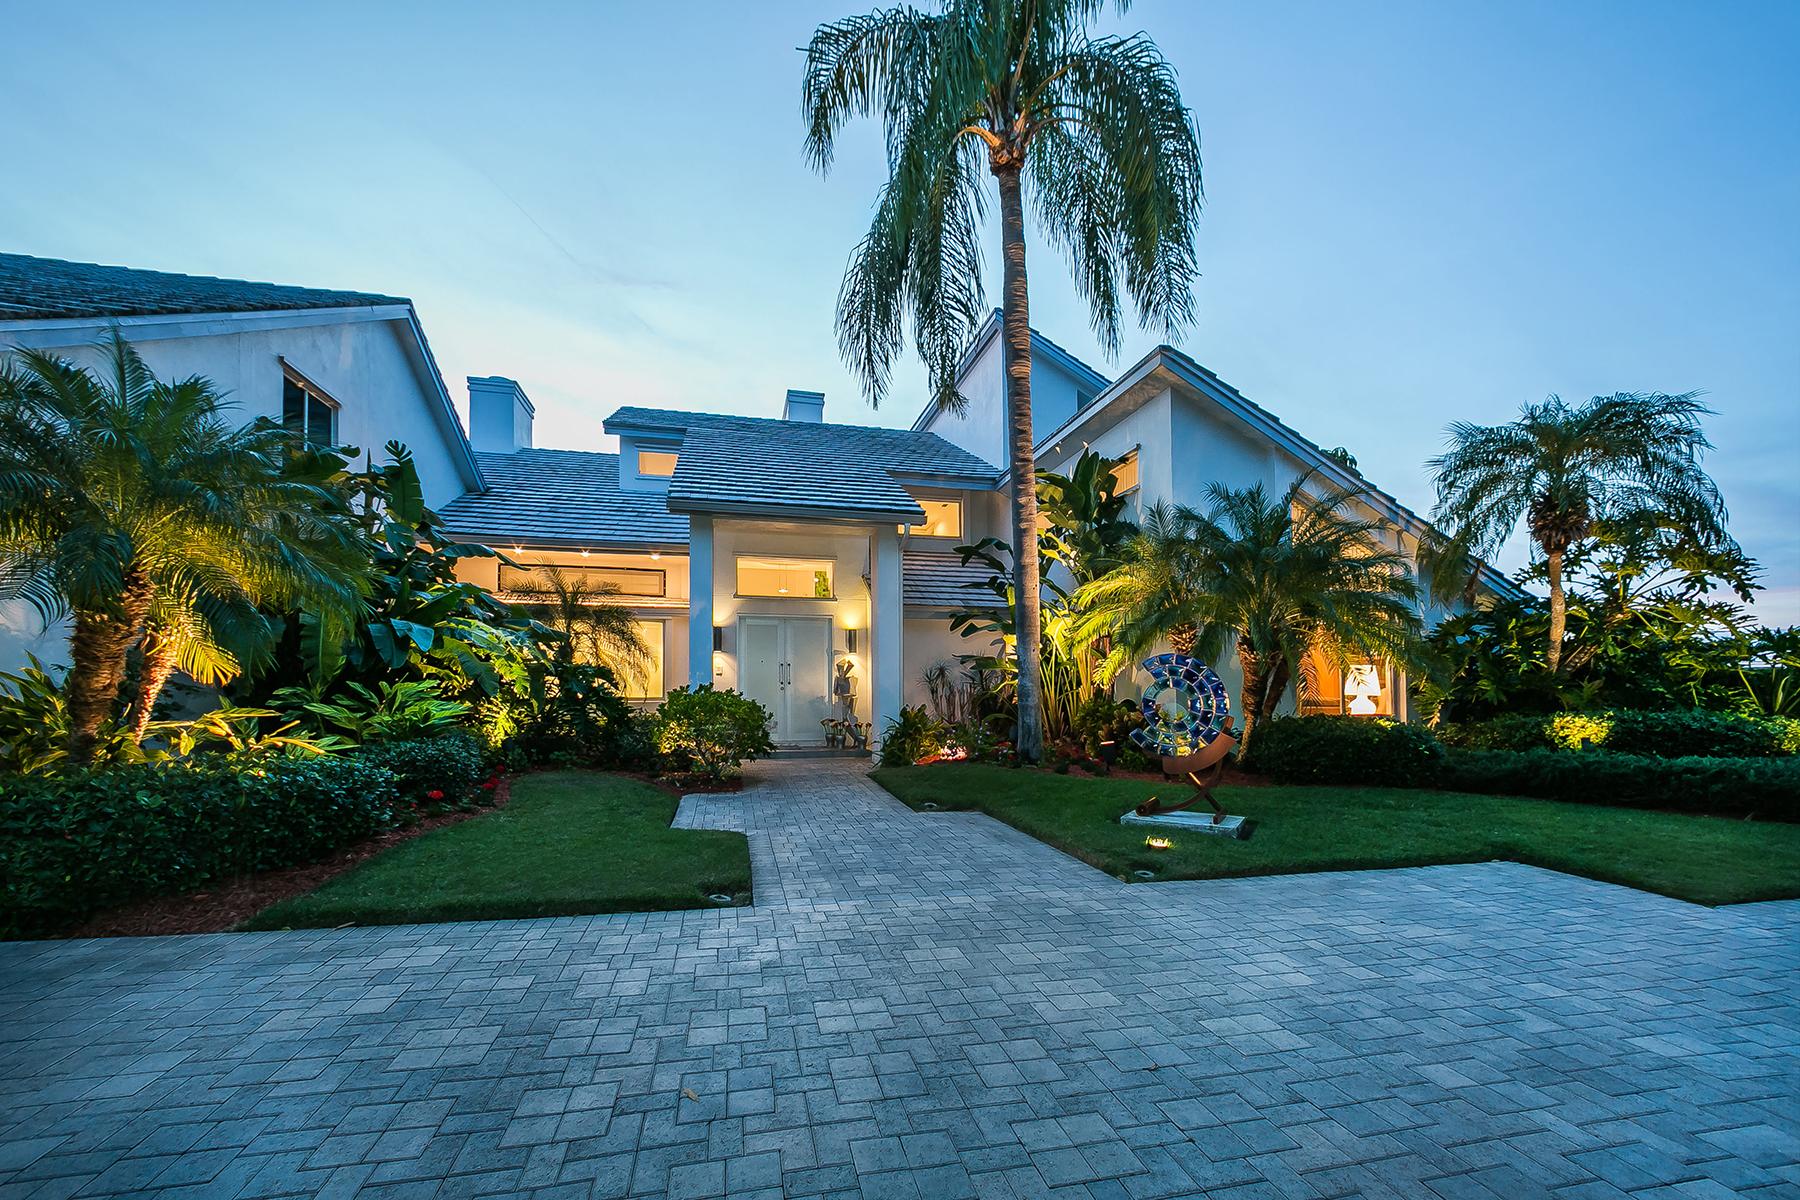 Additional photo for property listing at BIRD KEY 216  Bird Key Dr,  Sarasota, Florida 34236 United States